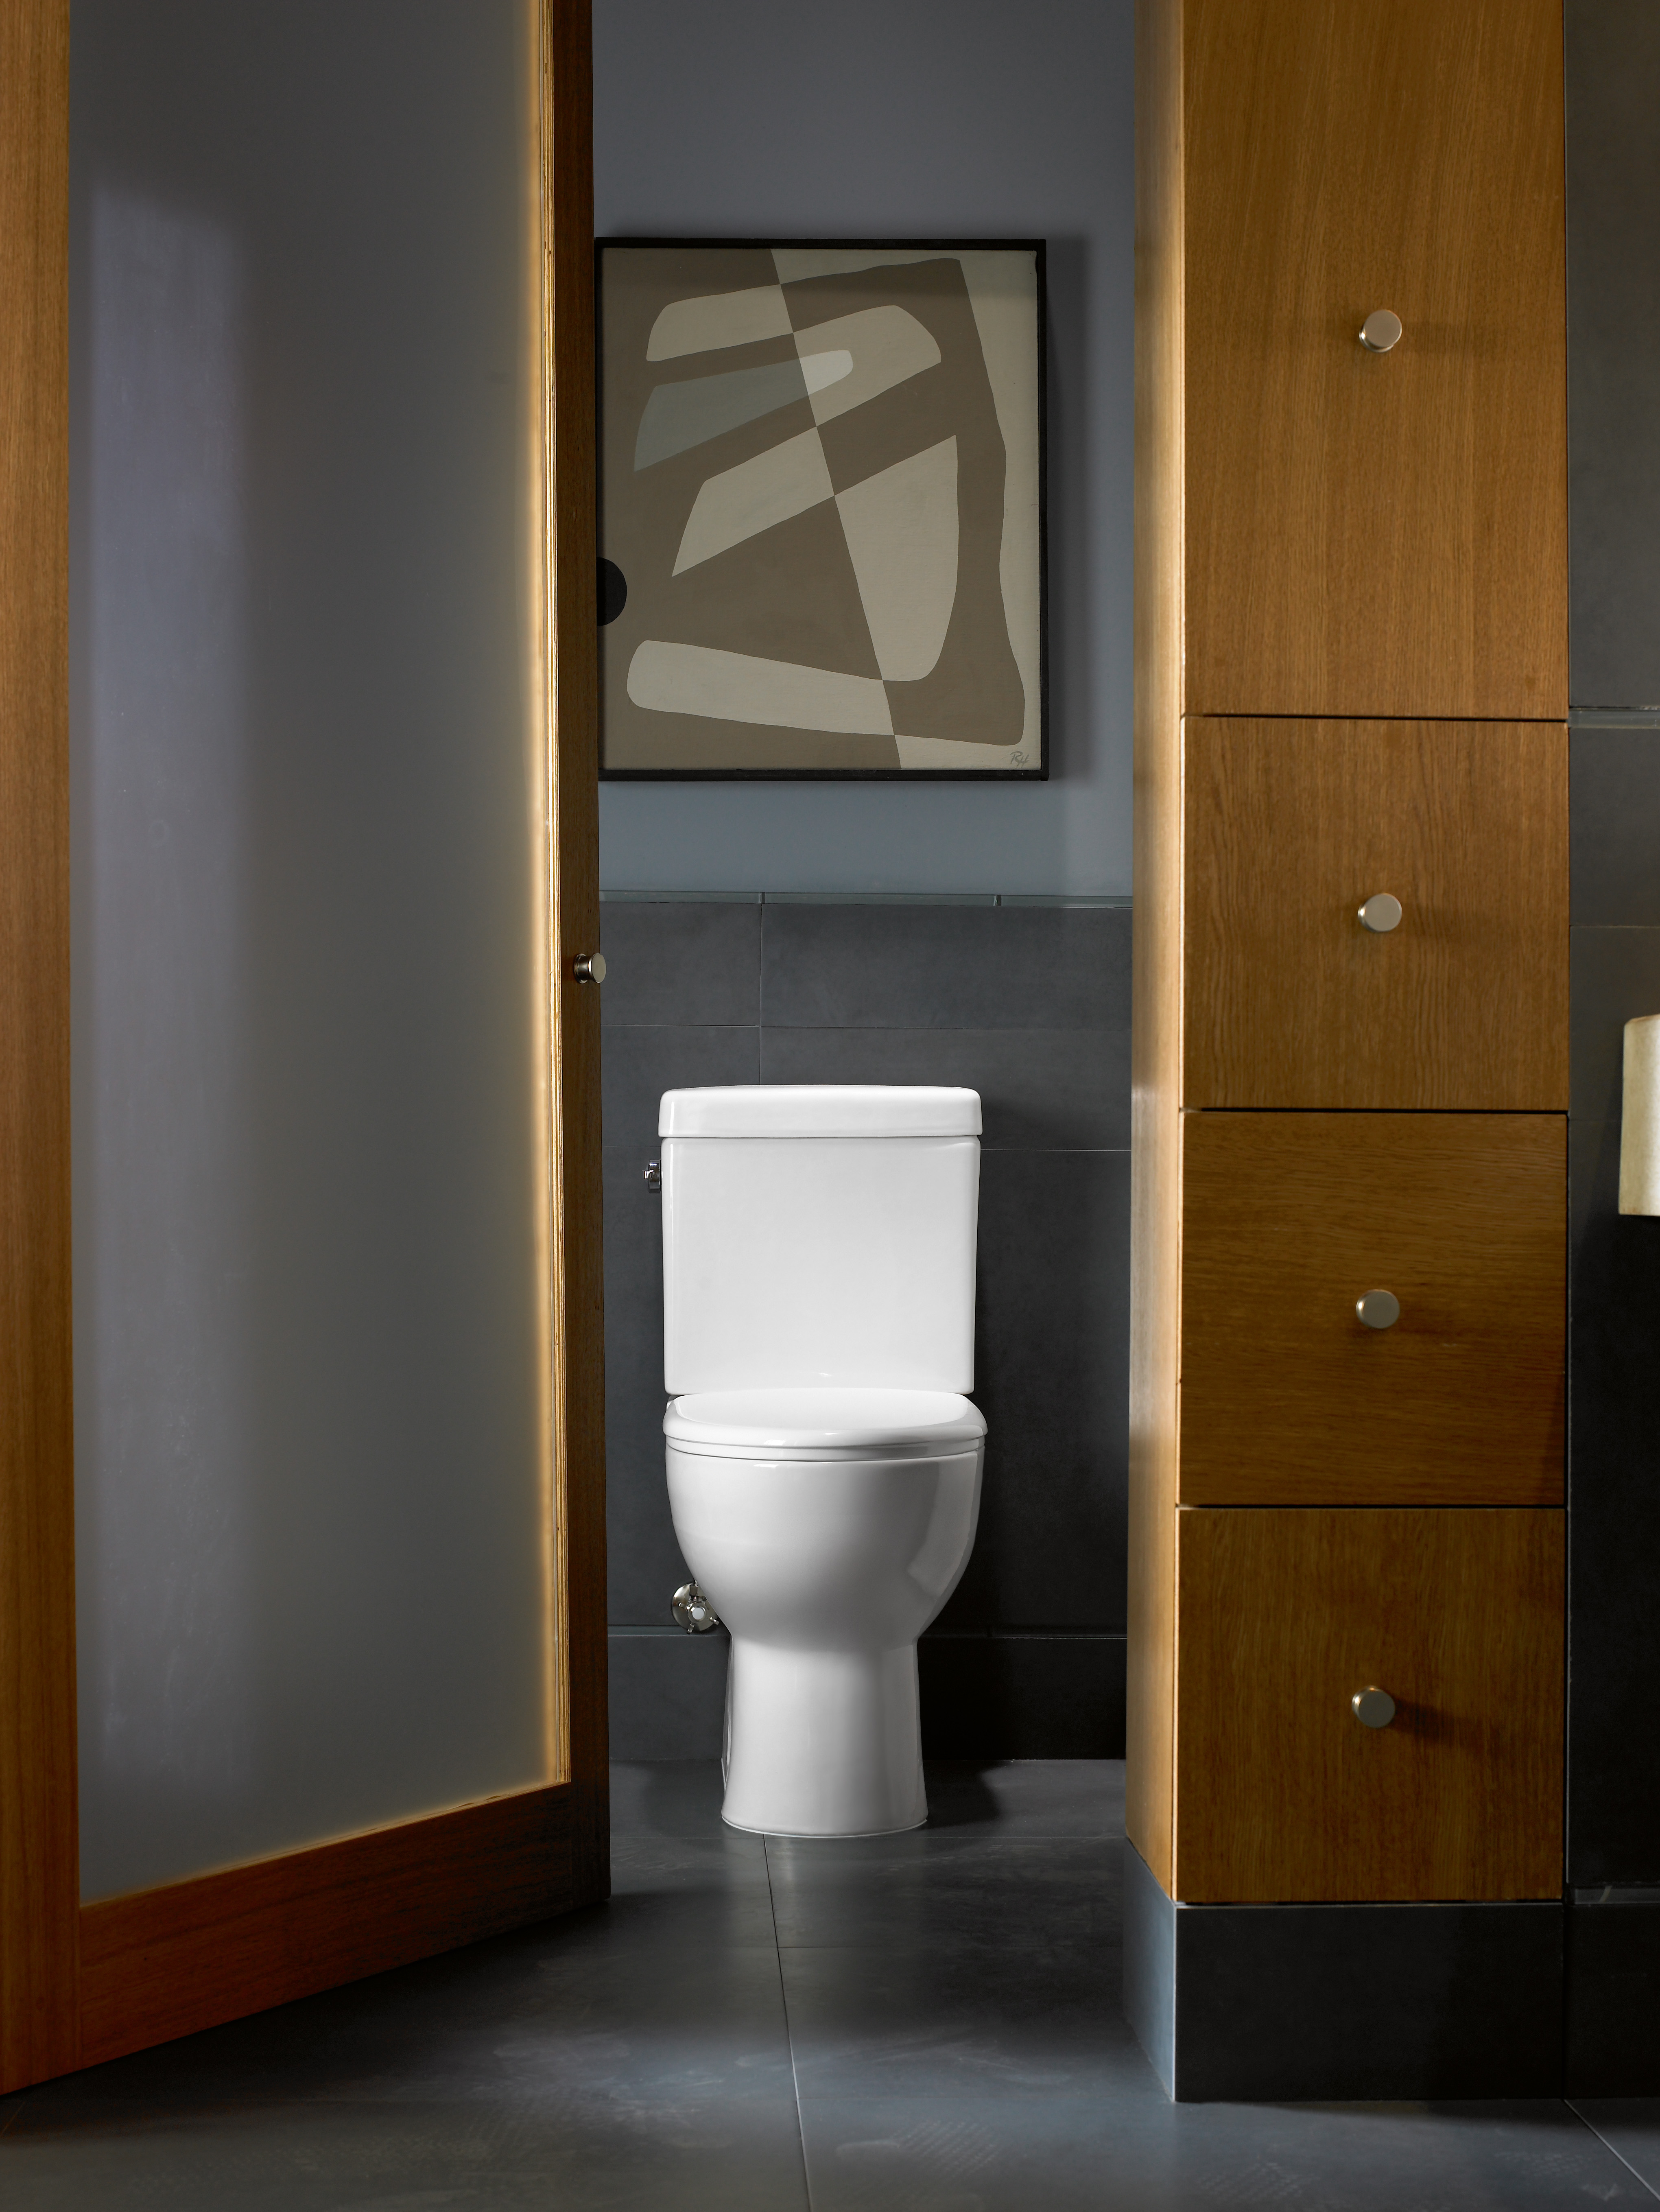 Twist Toilet seats